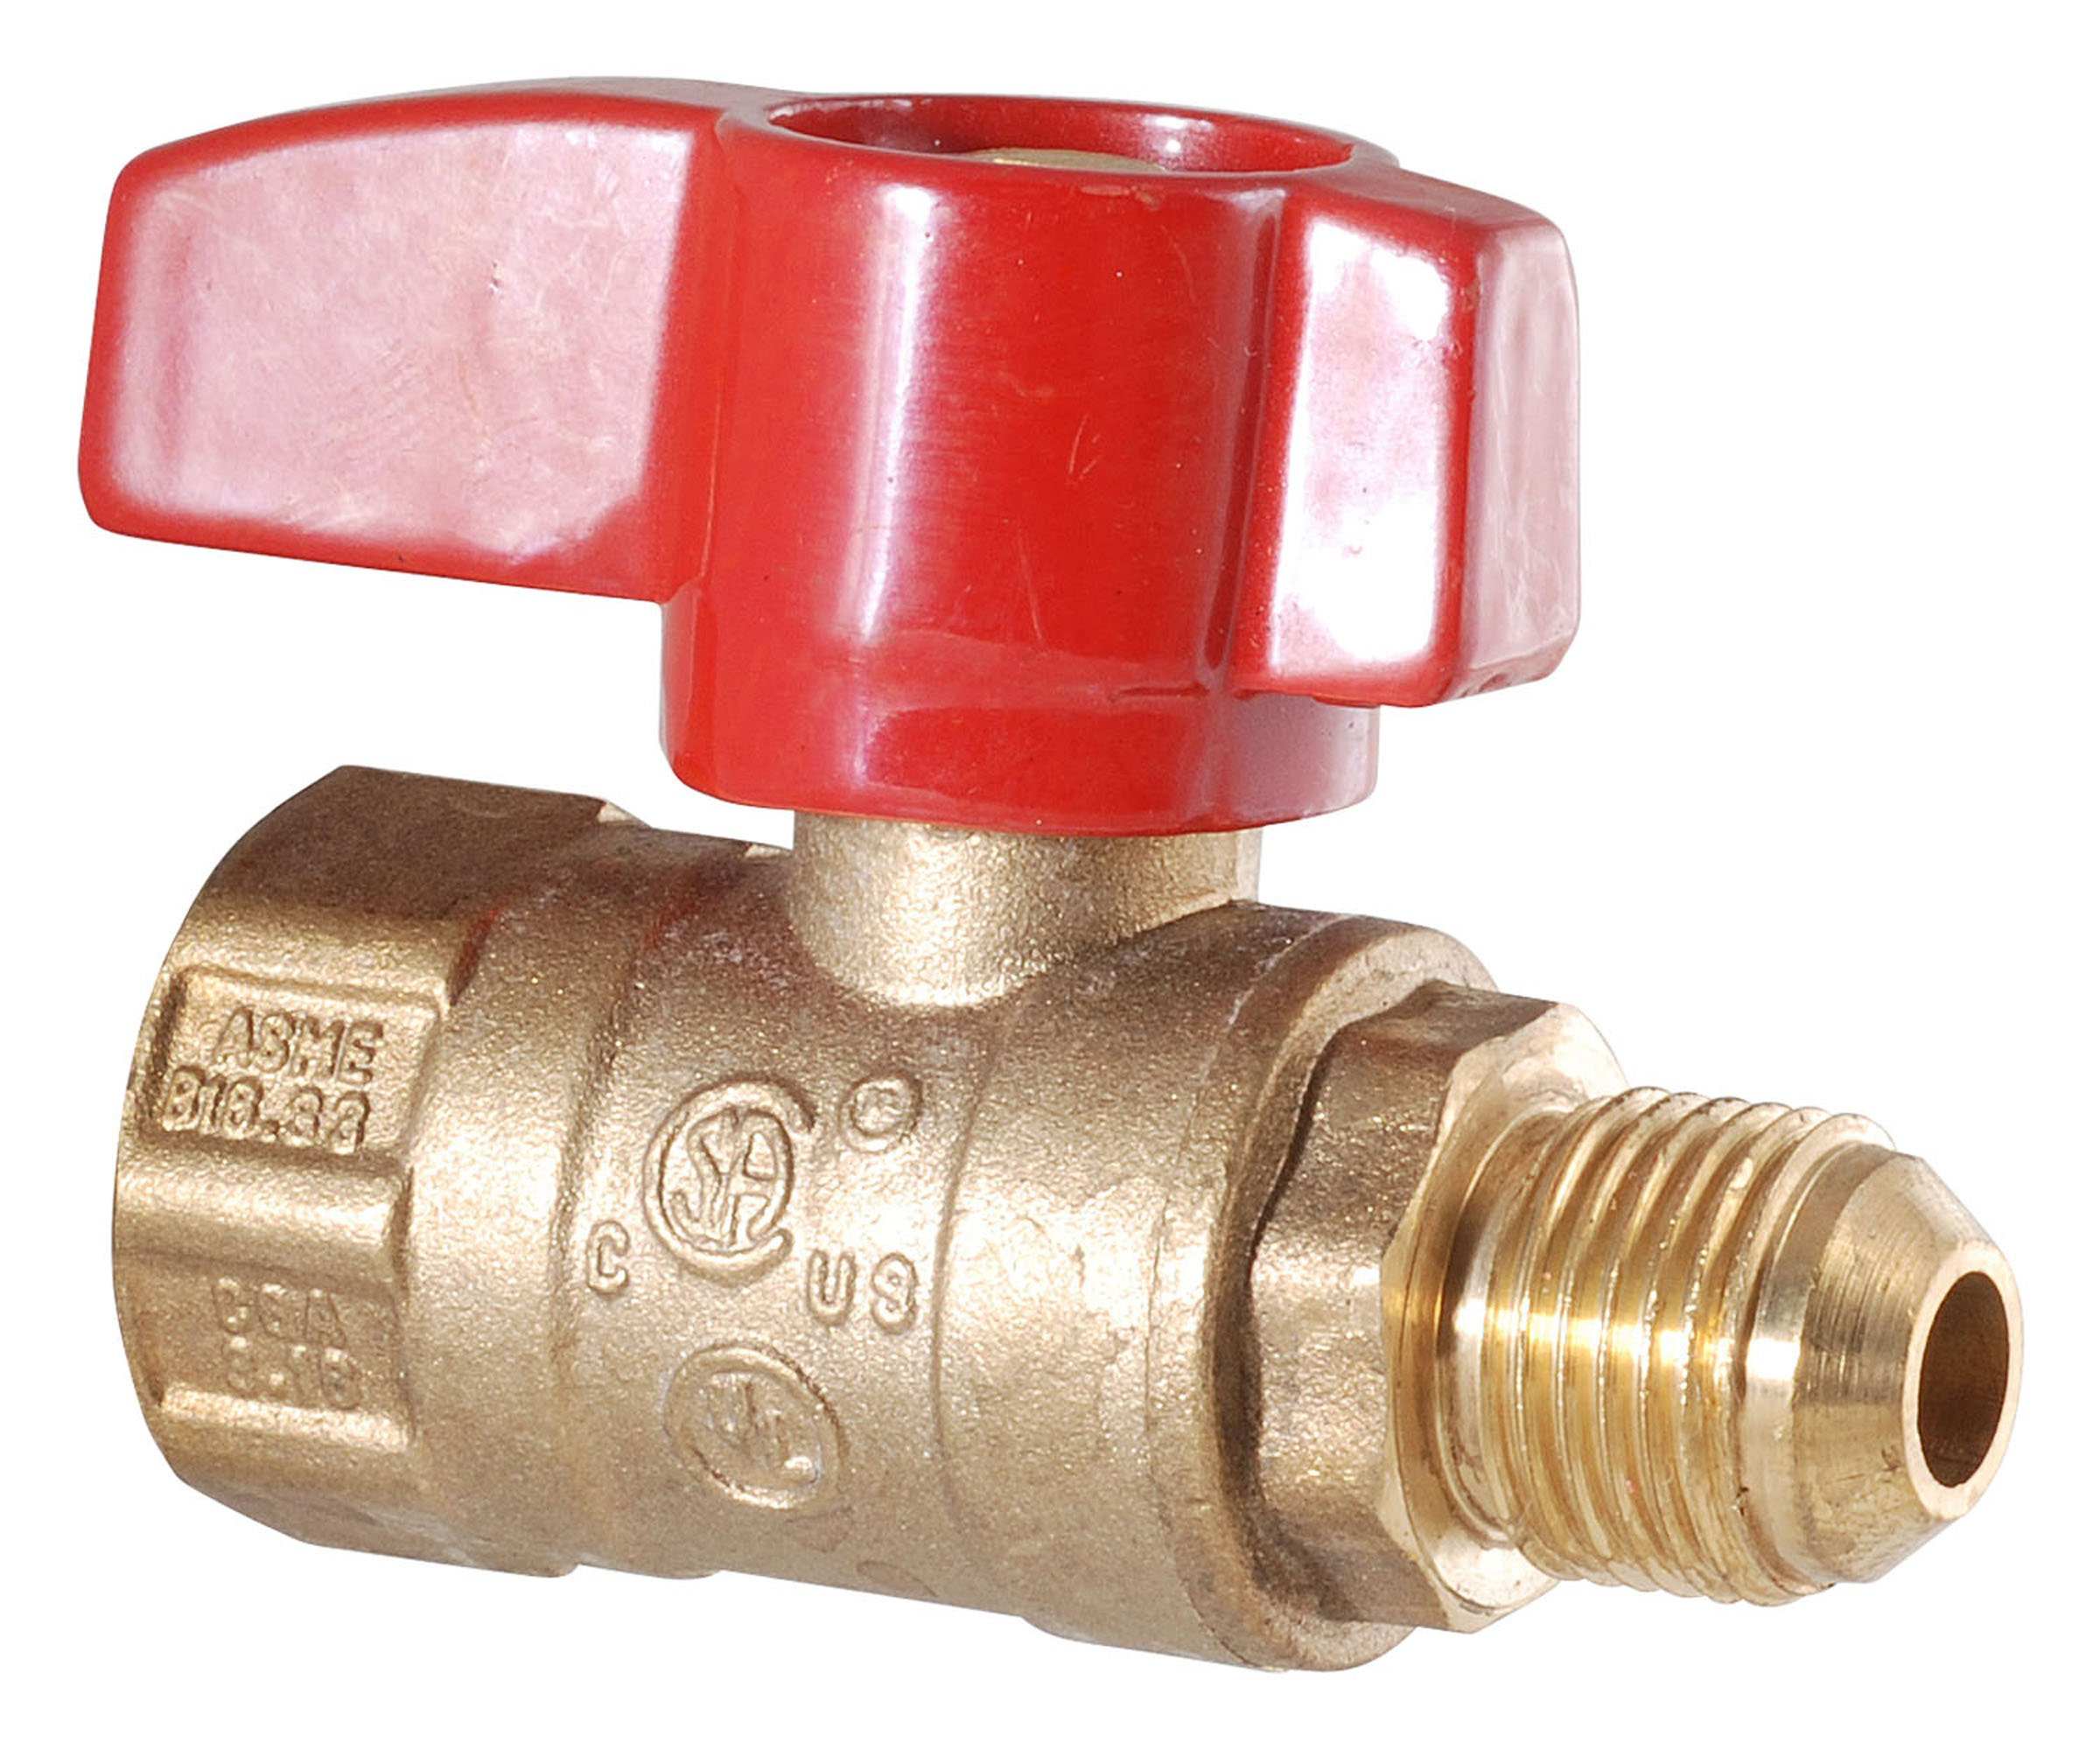 LDR 020 1540 1/2-Inch FIP x 3/8-Inch Flare Male Heavy Duty Gas Ball Valve, Brass